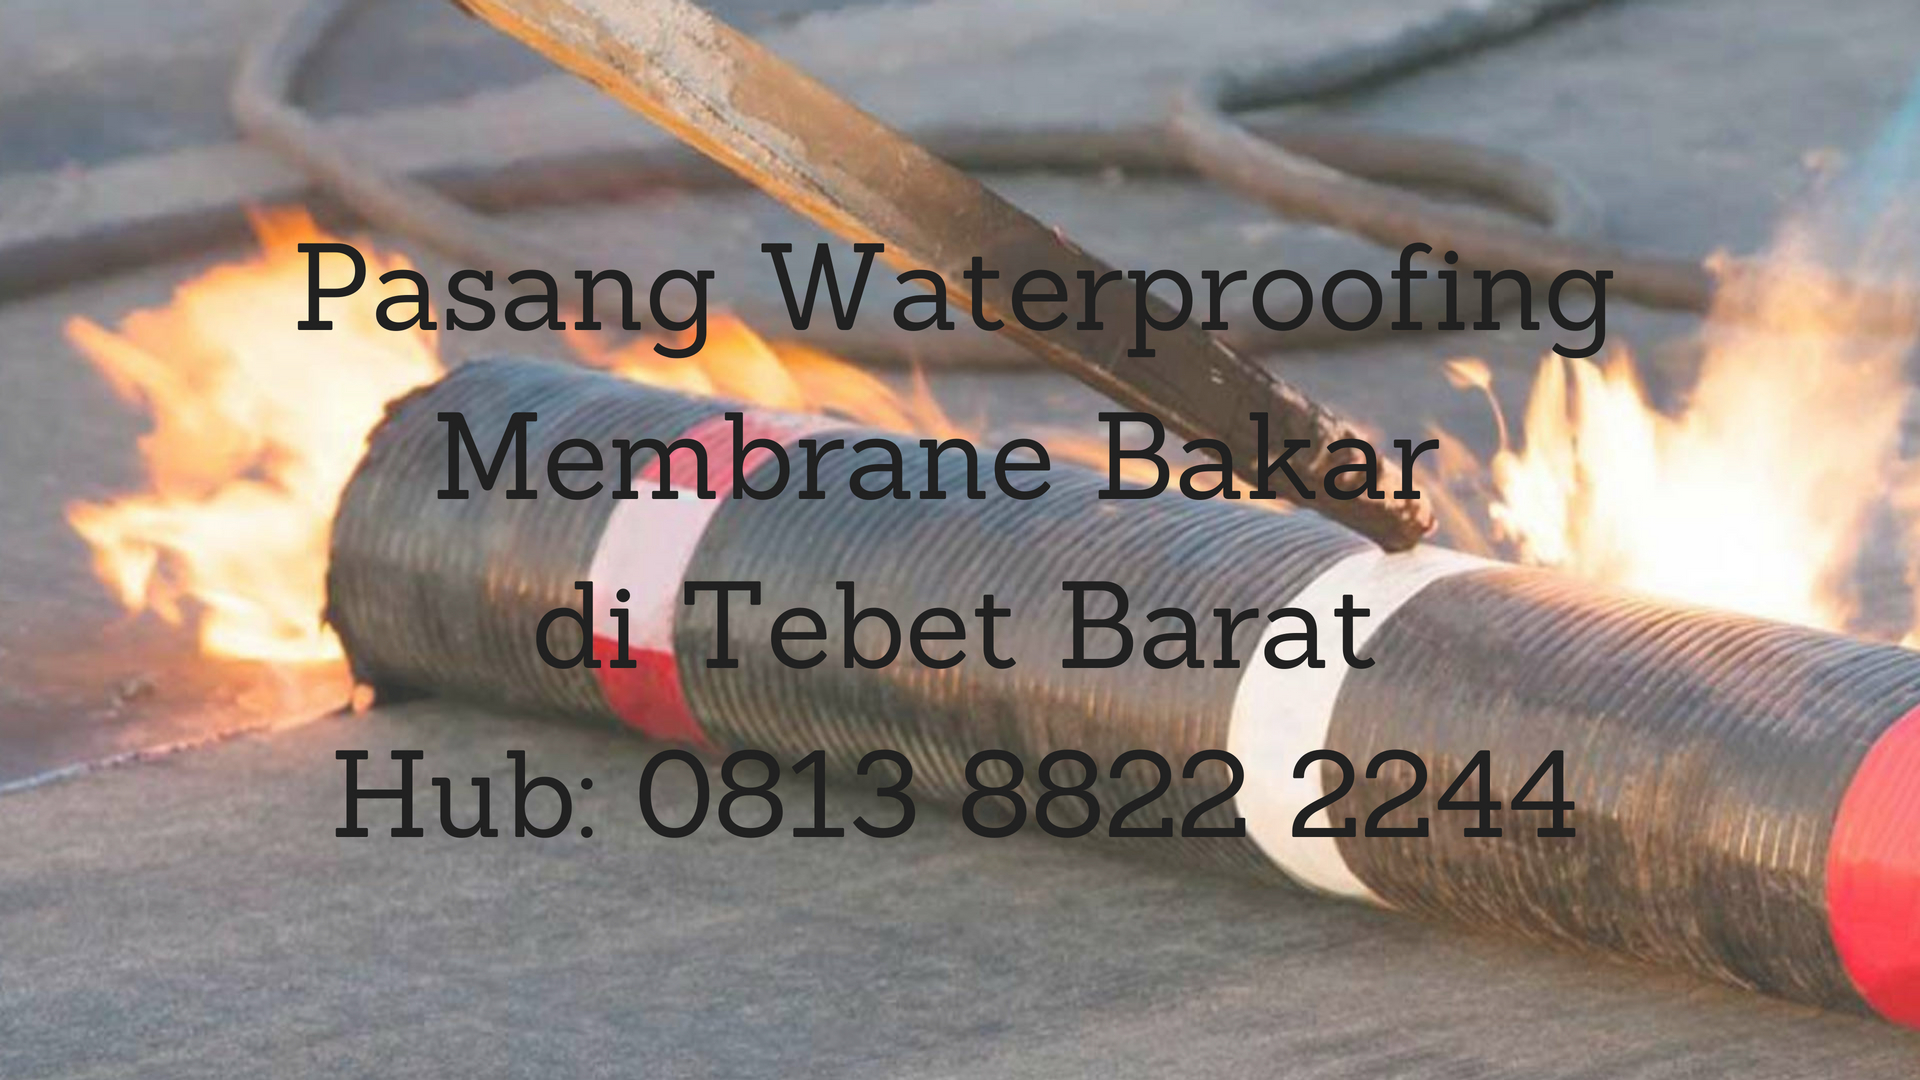 PASANG WATERPROOFING MEMBRANE BAKAR DI TEBET BARAT.  HUB : 0813 8822 2244